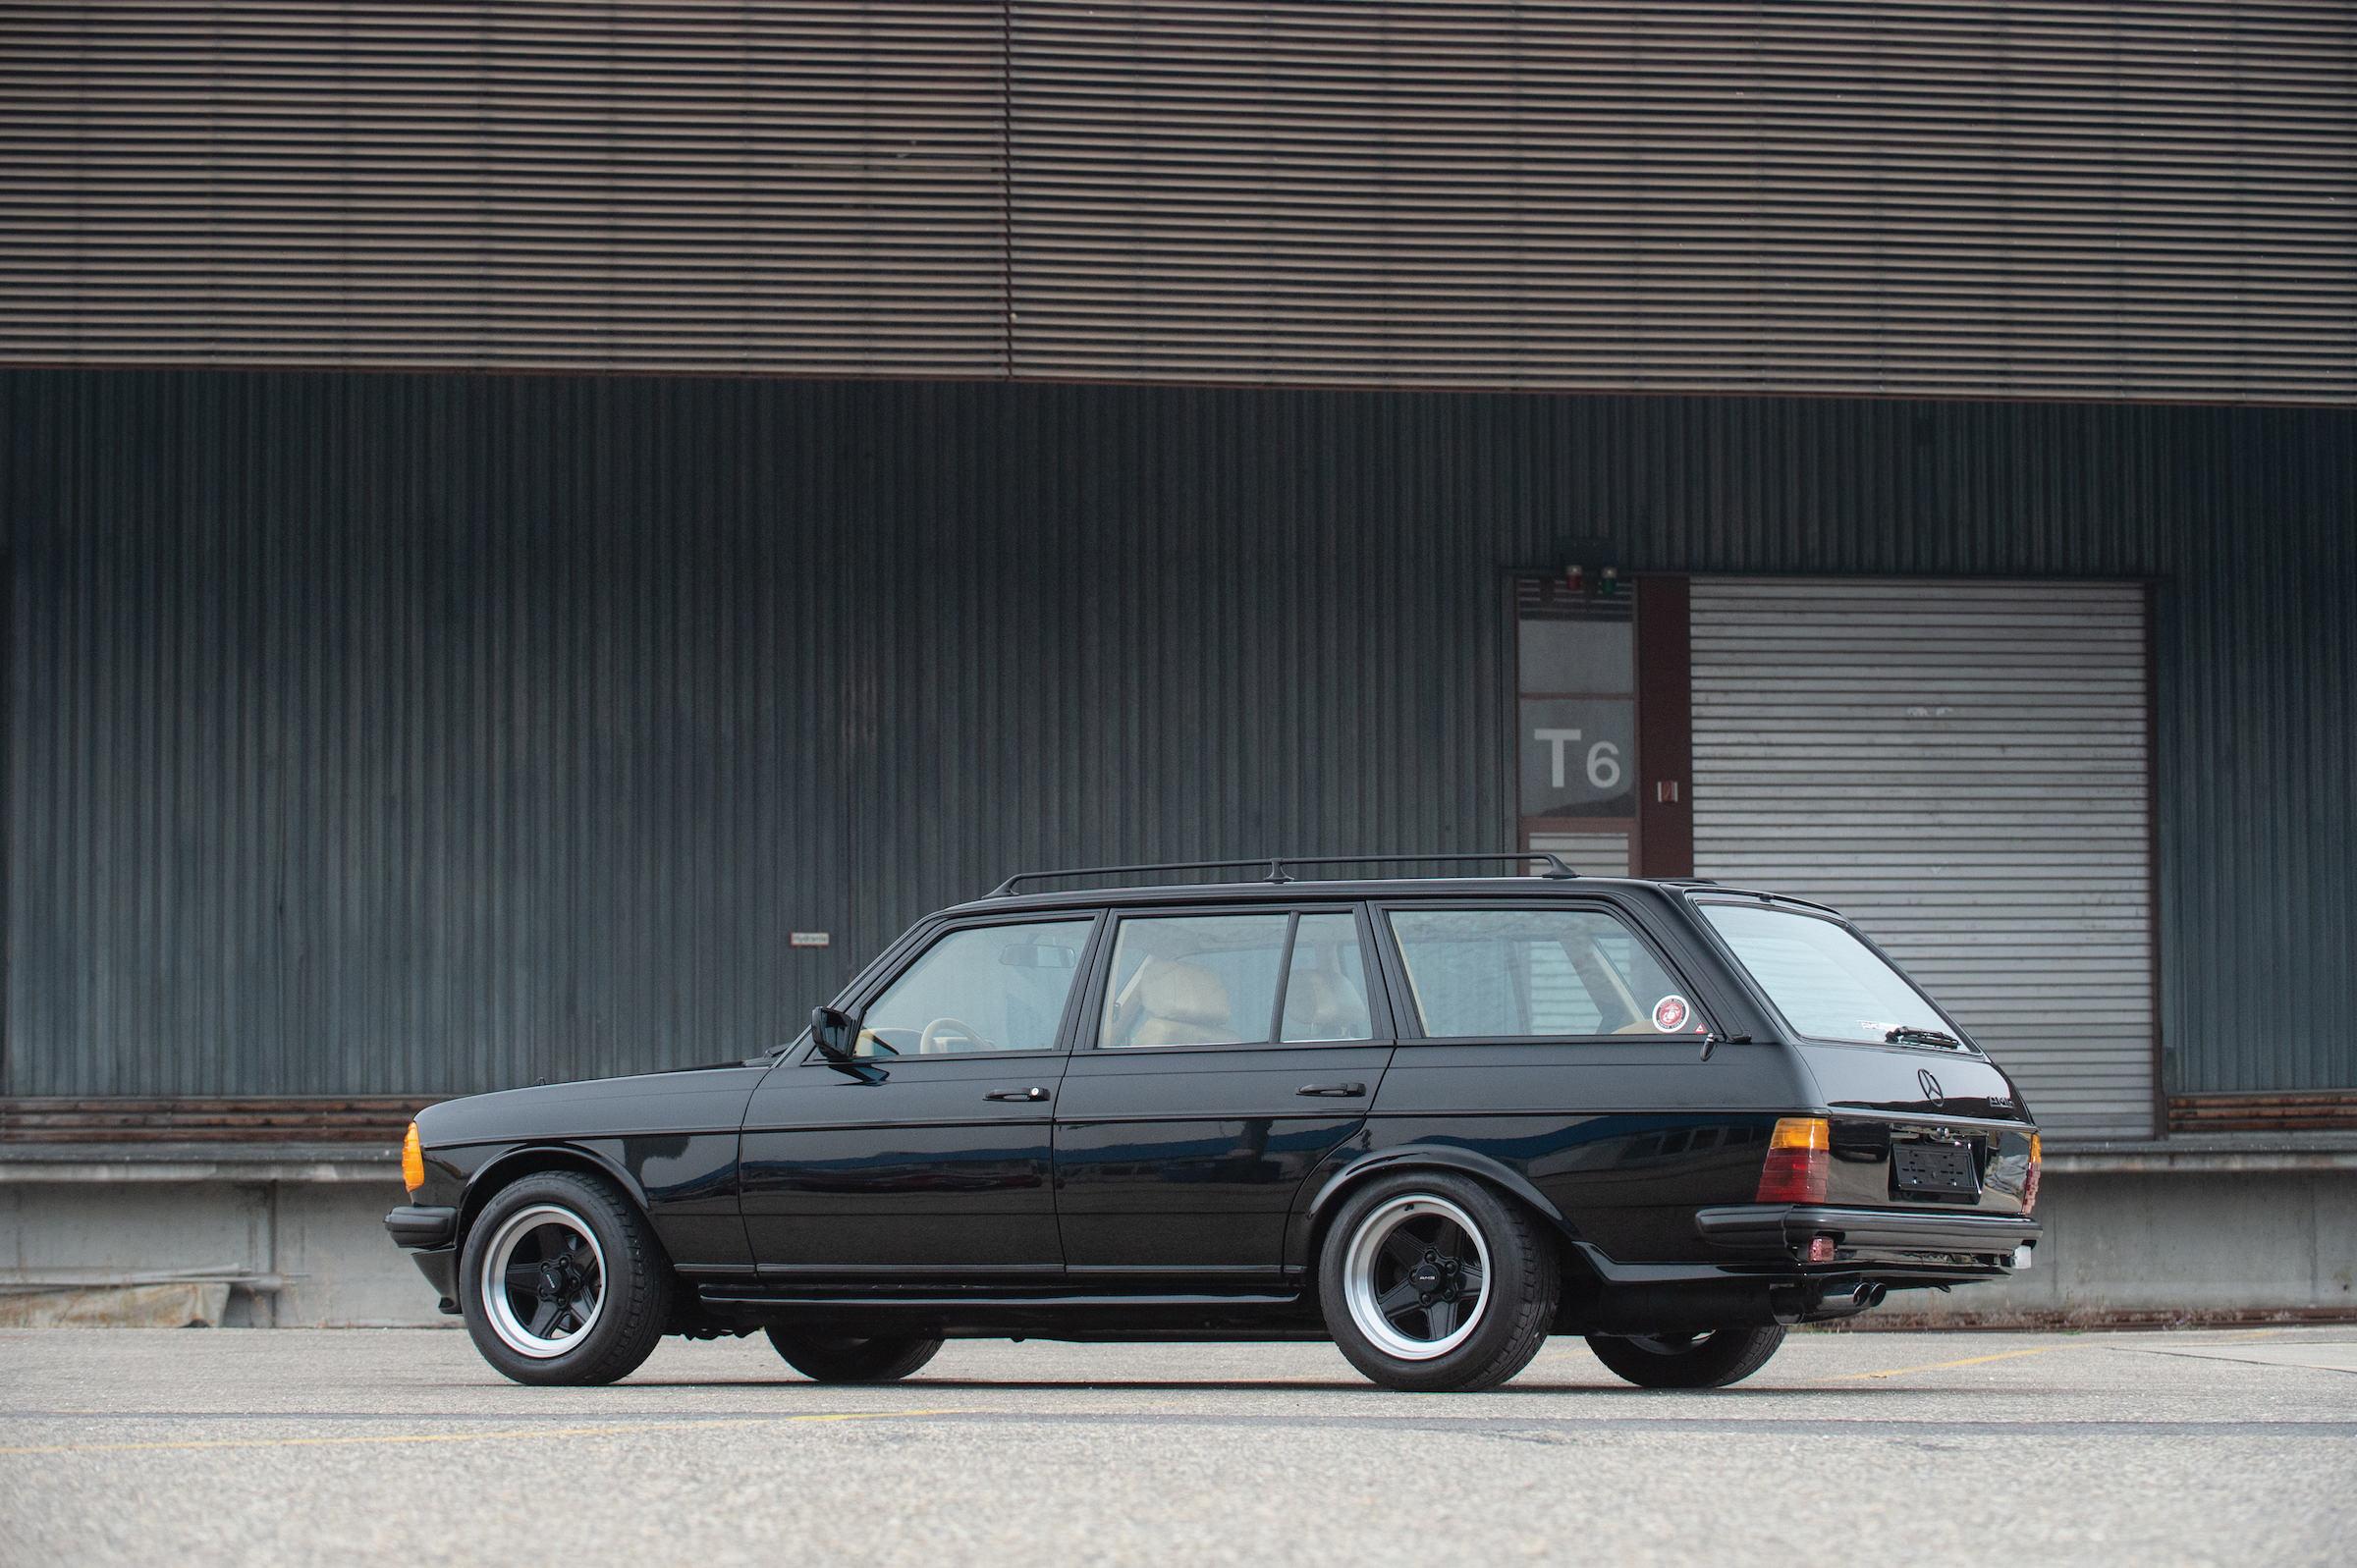 German Mystery Wagon: A 1979 Mercedes-Benz 500 TE AMG